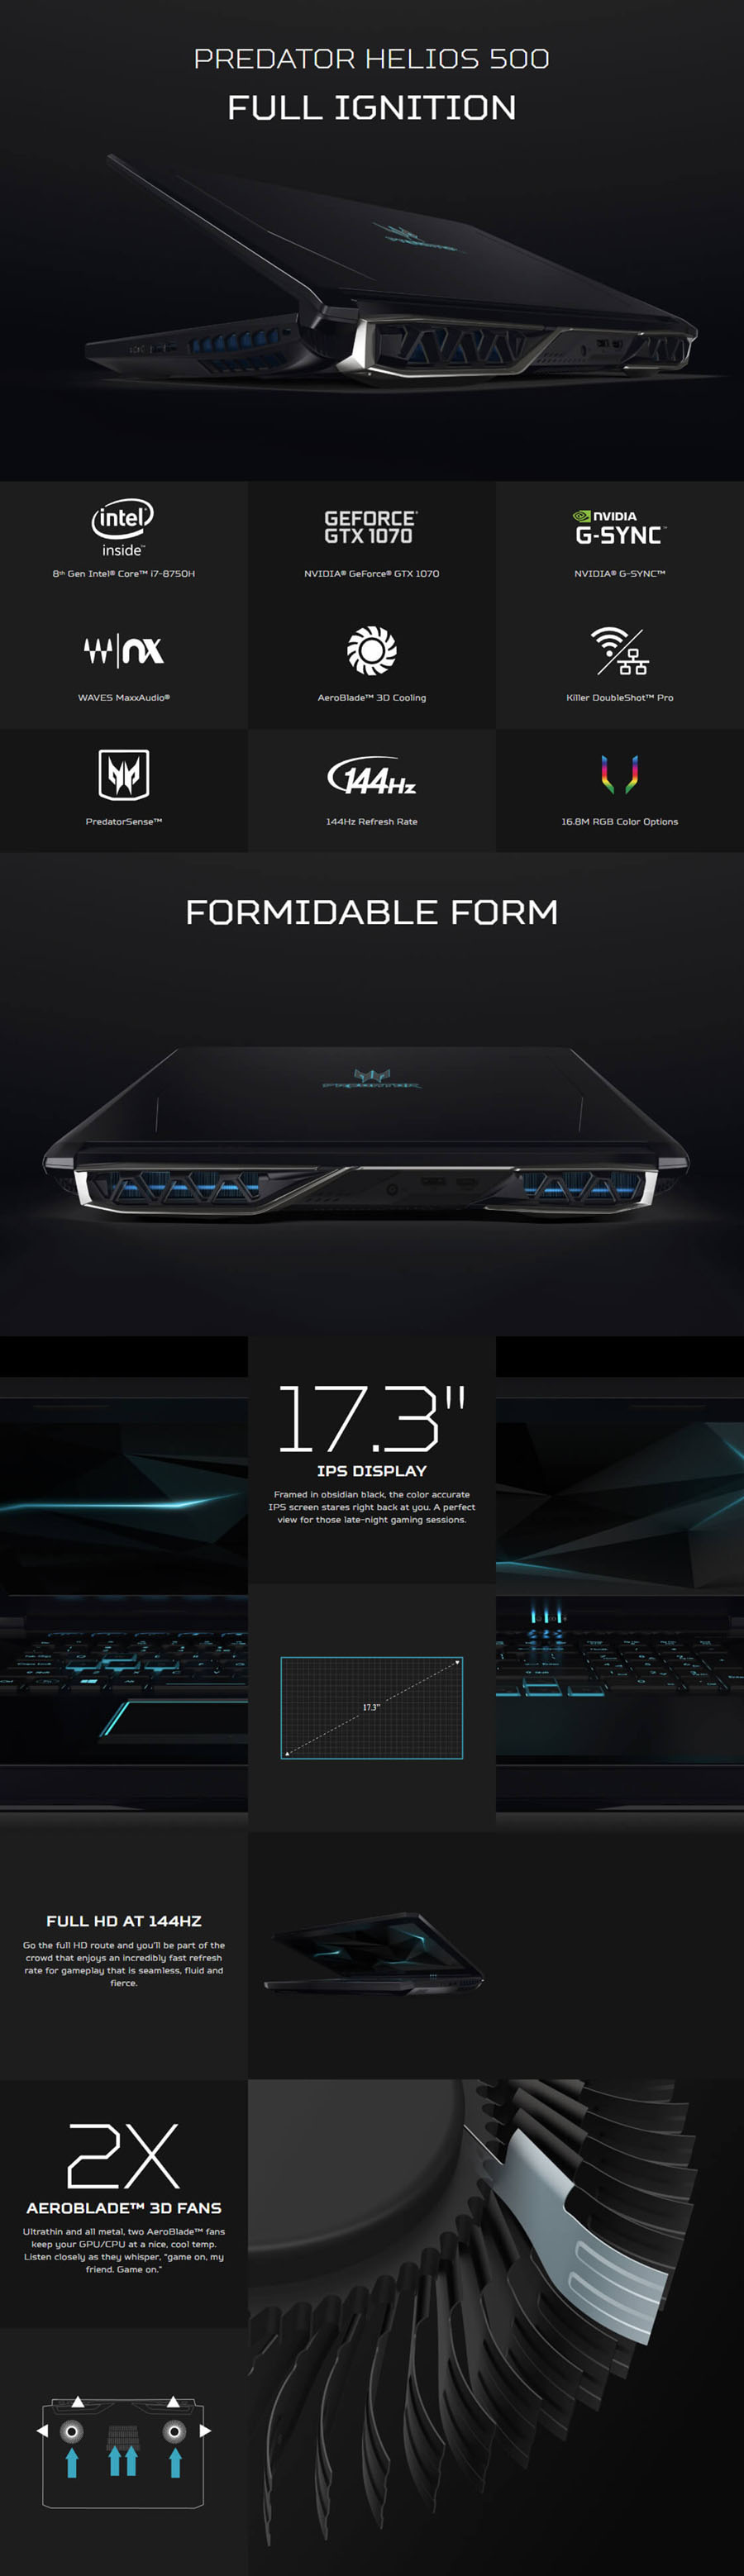 Acer Predator Helios 500 17 3in FHD IPS 144Hz i7 8750H GTX 1070 256GB SSD +  2TB HDD Gaming Laptop (PH517-51-720B)